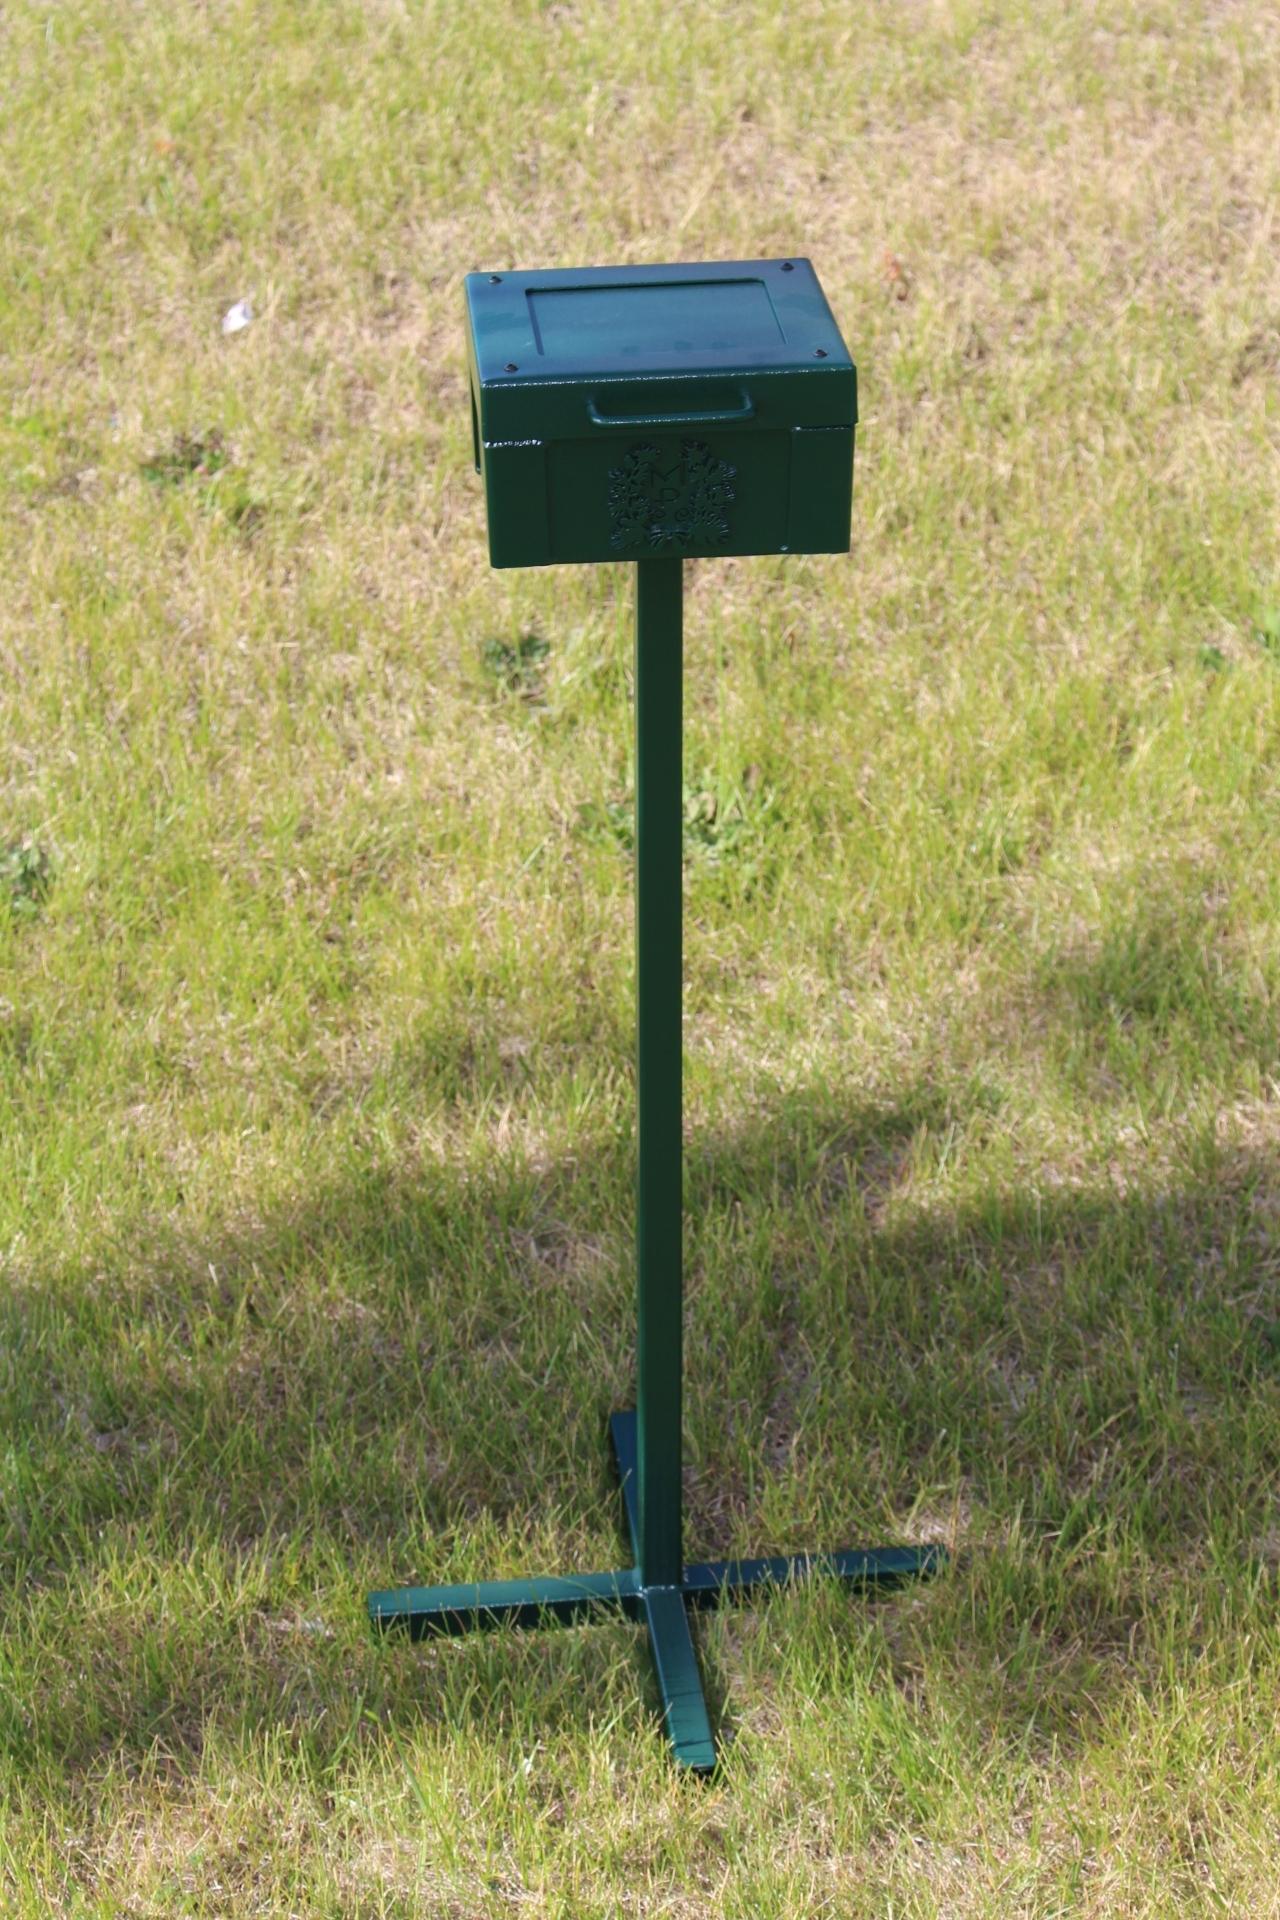 SCORECARD BOX WITH STAND